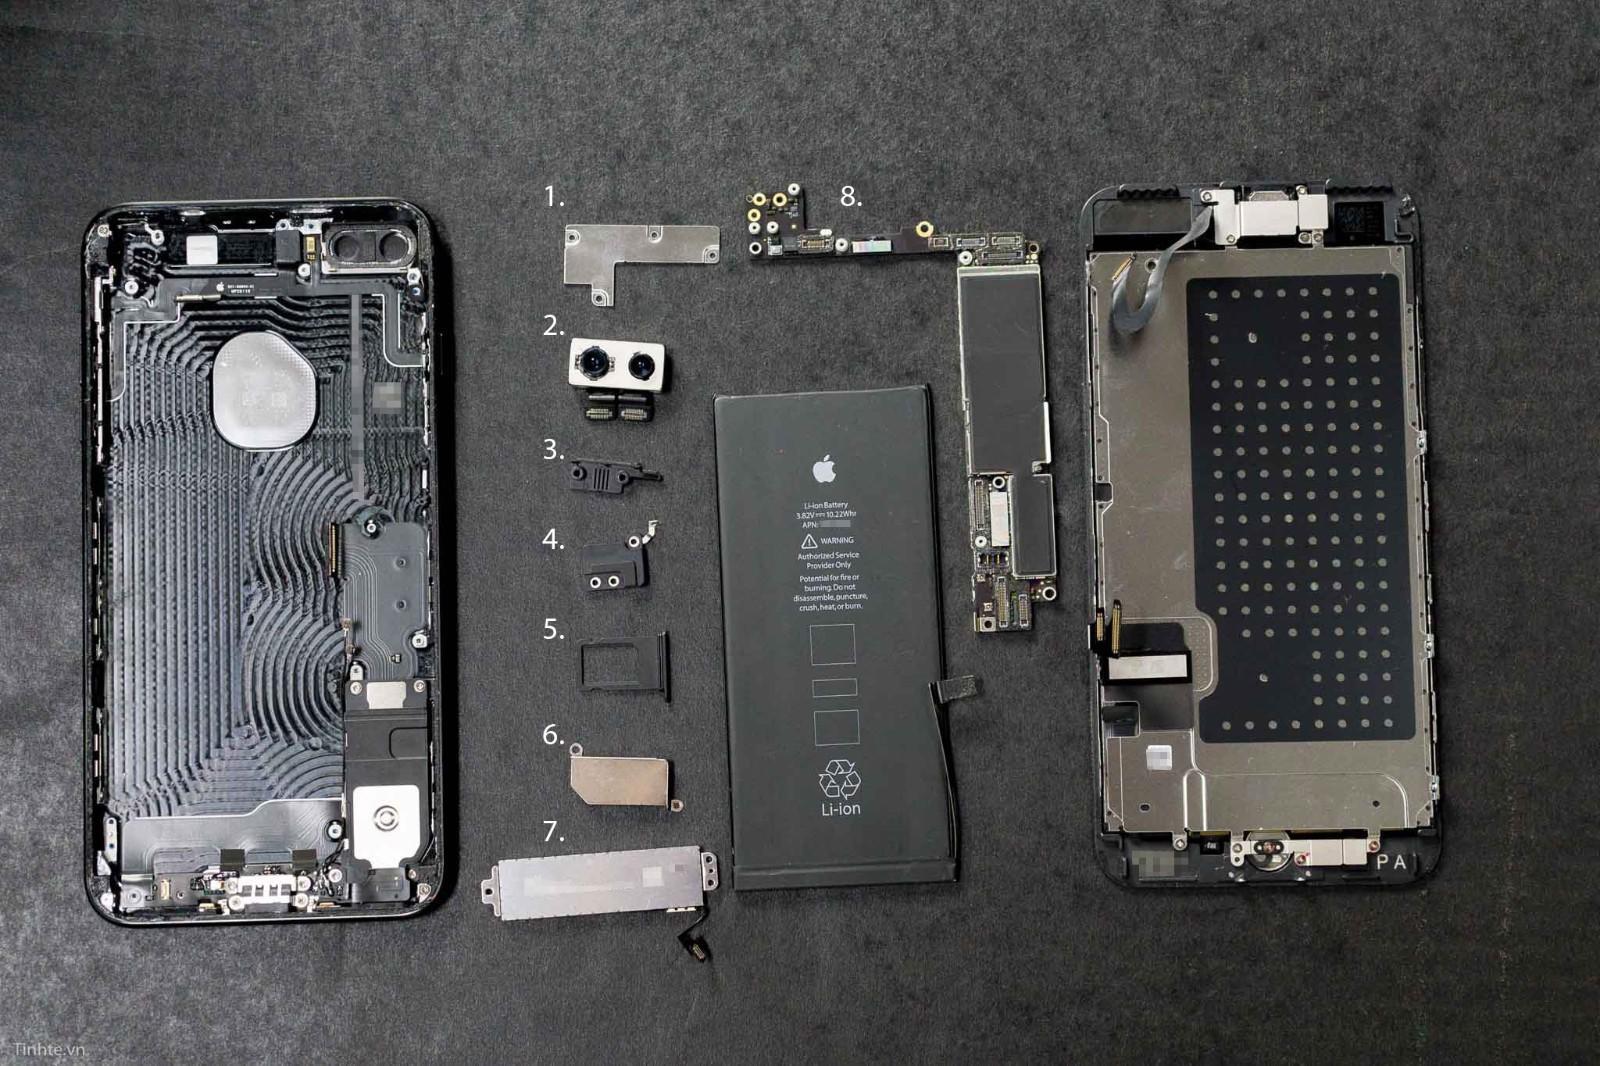 iphone 7 plus拆解,成本价1500卖7000